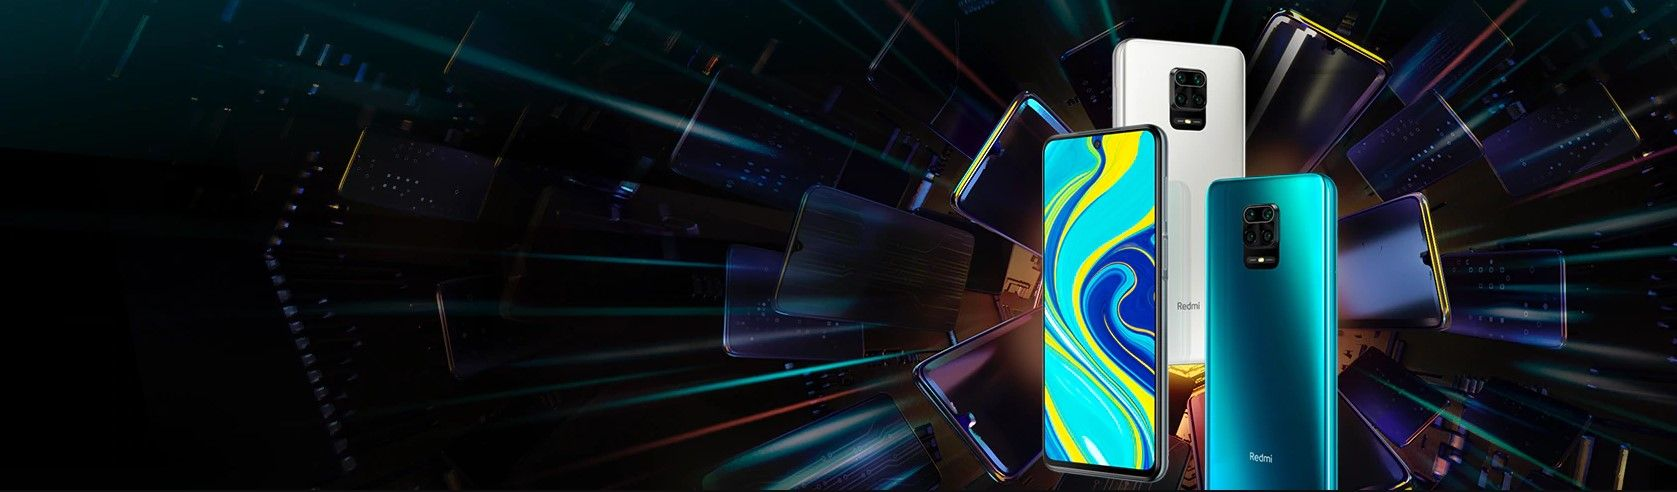 Xiaomi Redmi Note 9S купить в Москве